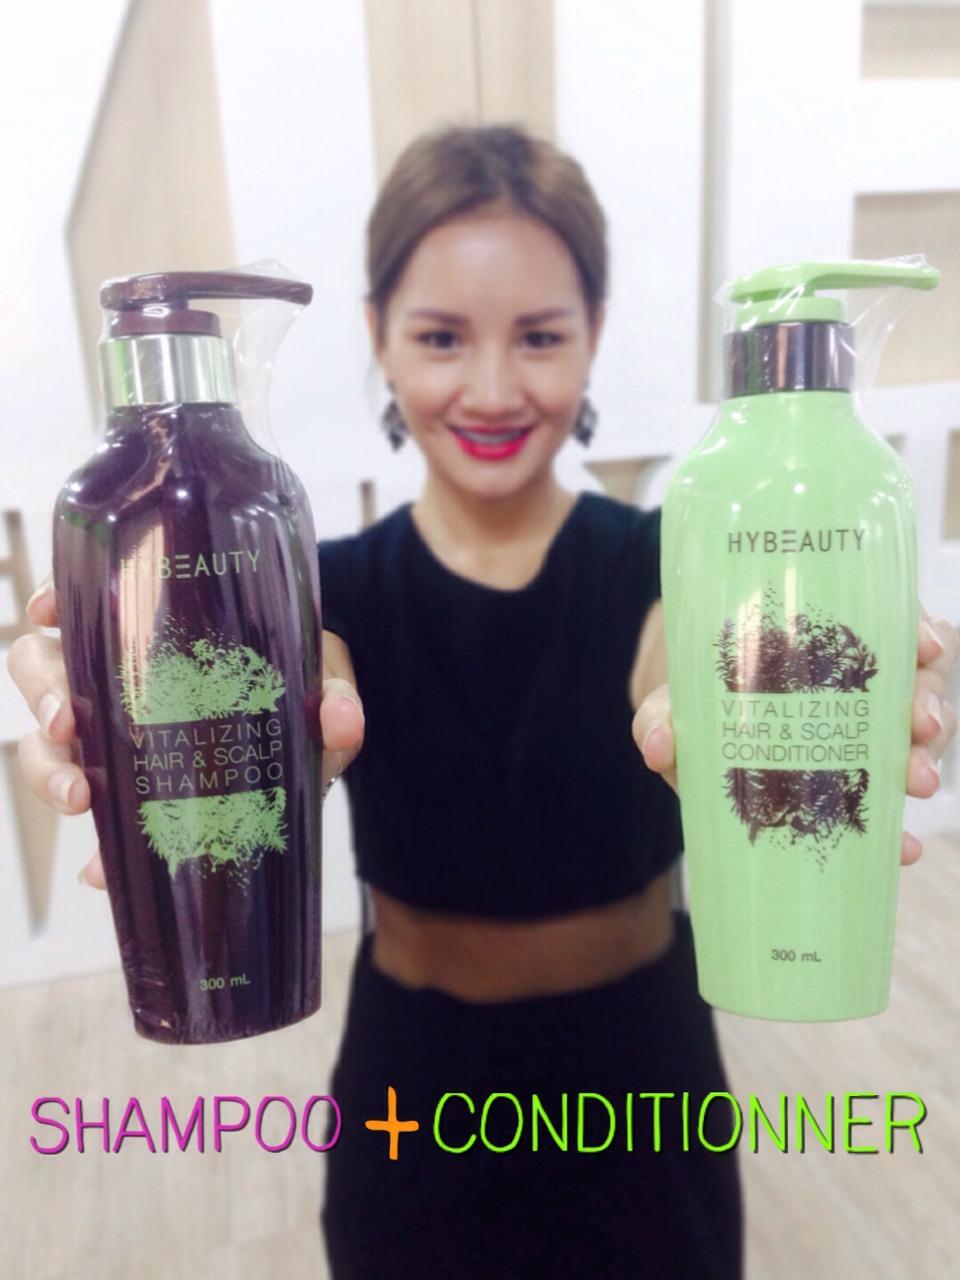 HyBeauty Vitalizing Hair & Scalp Shampoo Conditioner